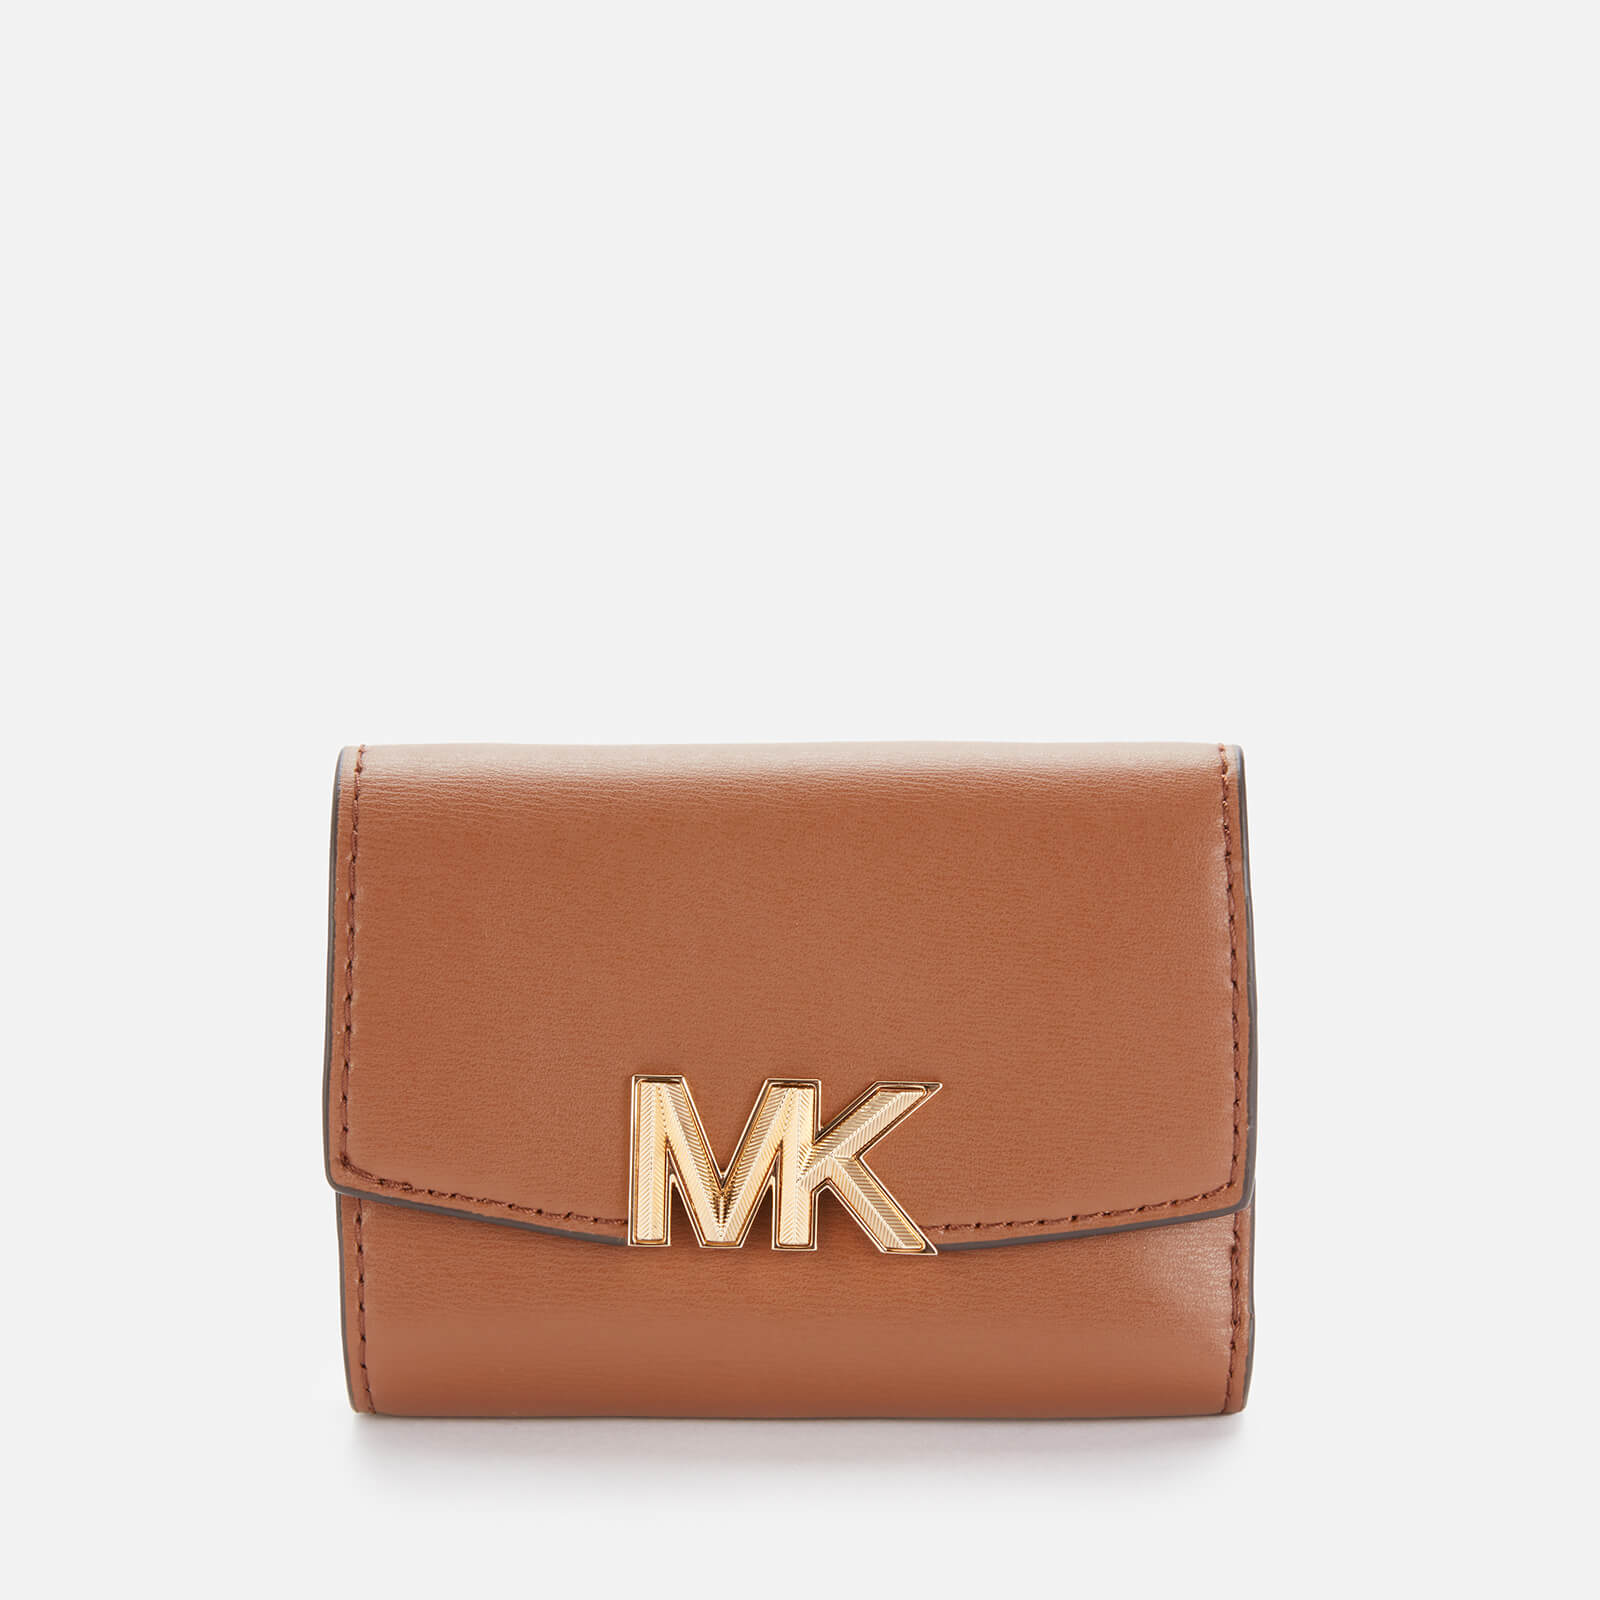 MICHAEL Michael Kors Women's Karlie Billfold Wallet - Luggage